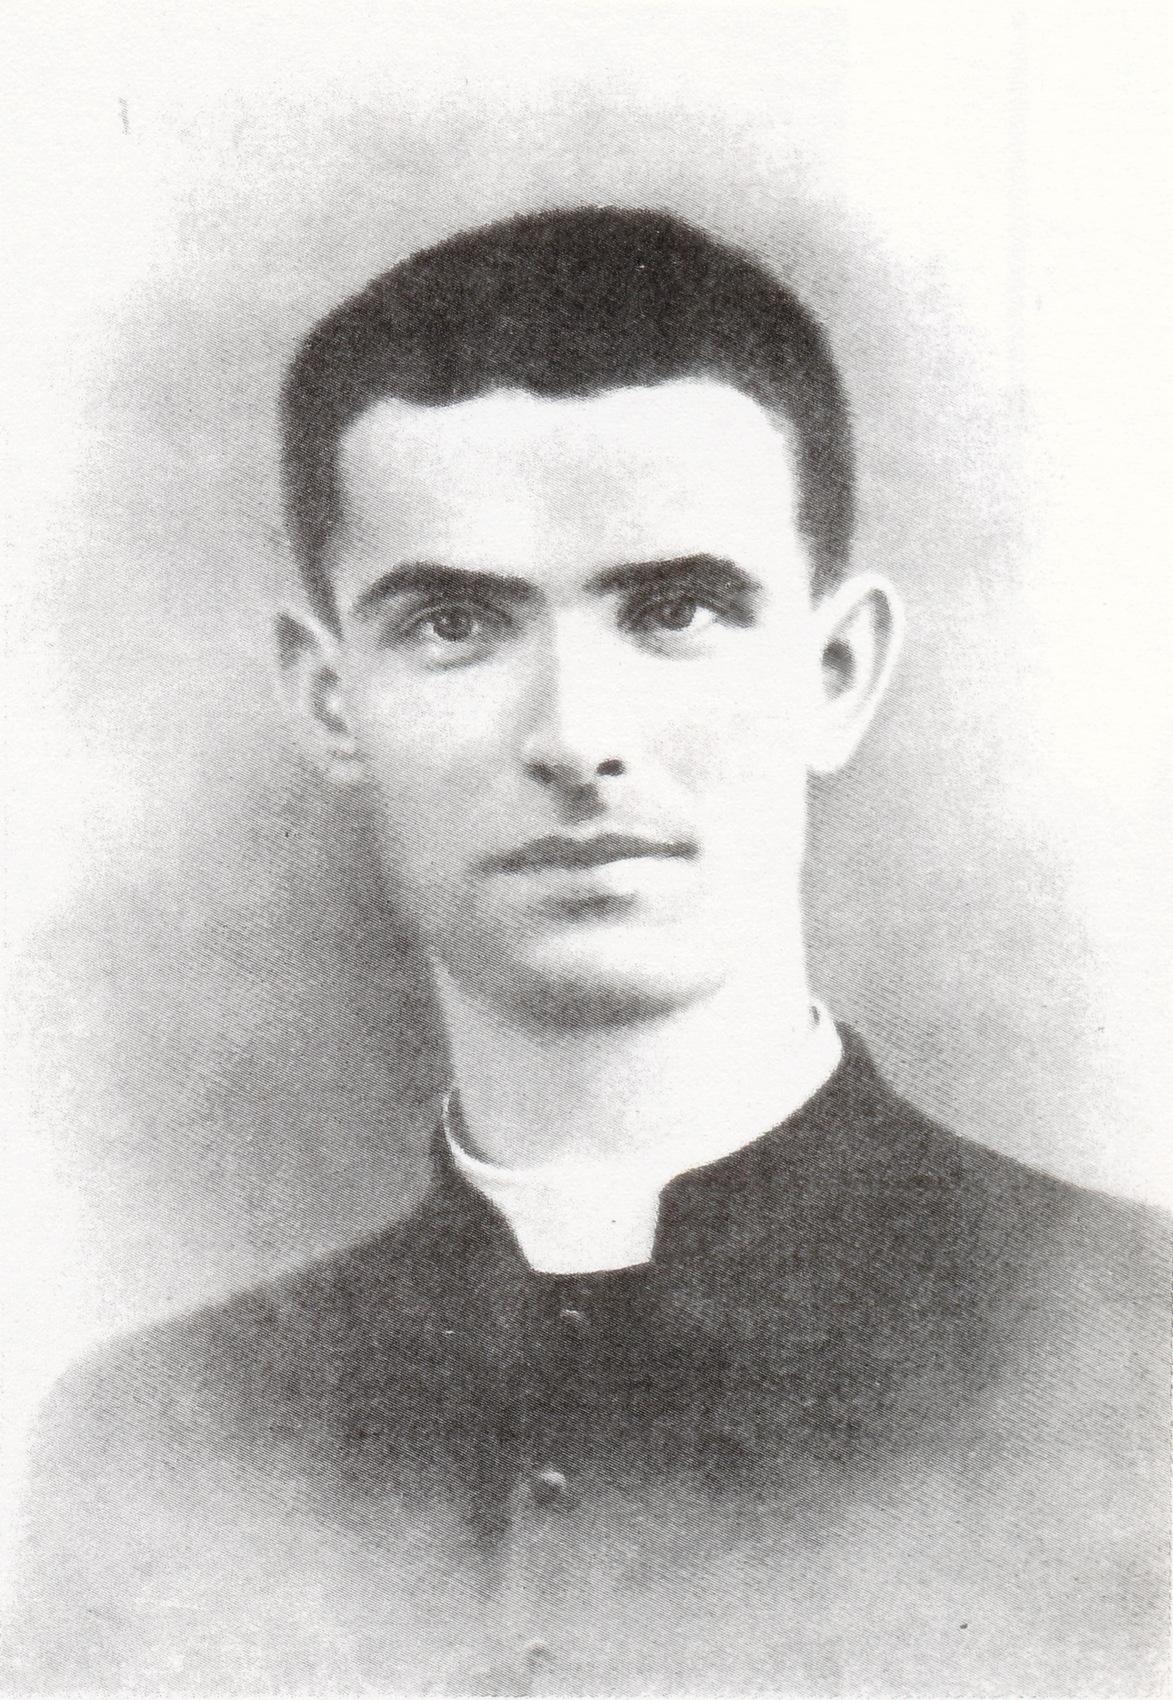 Don Giuseppe Giacomelli 1915-1945.